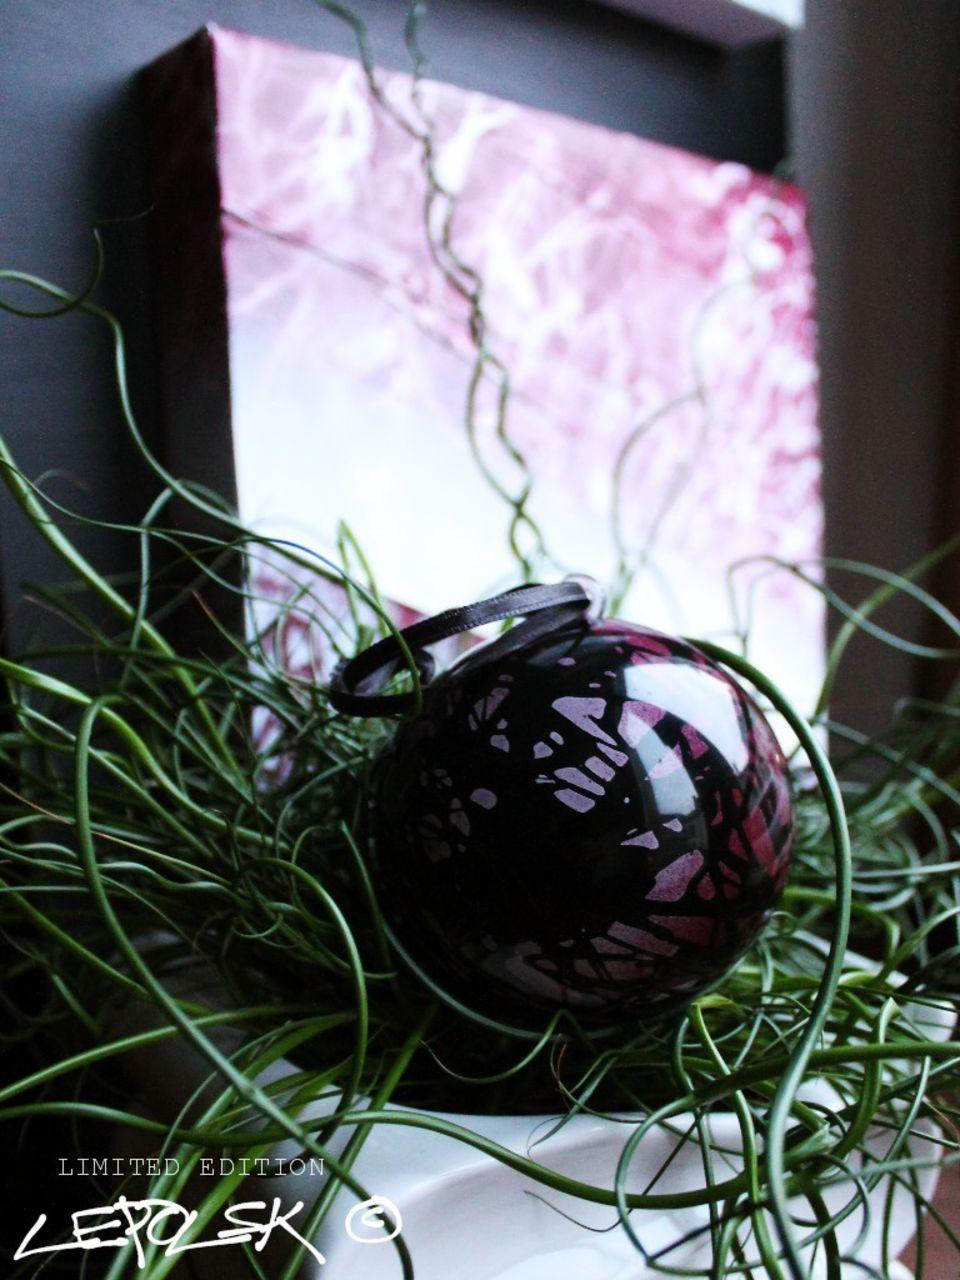 LEPOLSK MATUSZEWSKI Prune, La boule de Noël  lepolsk Matuszewski